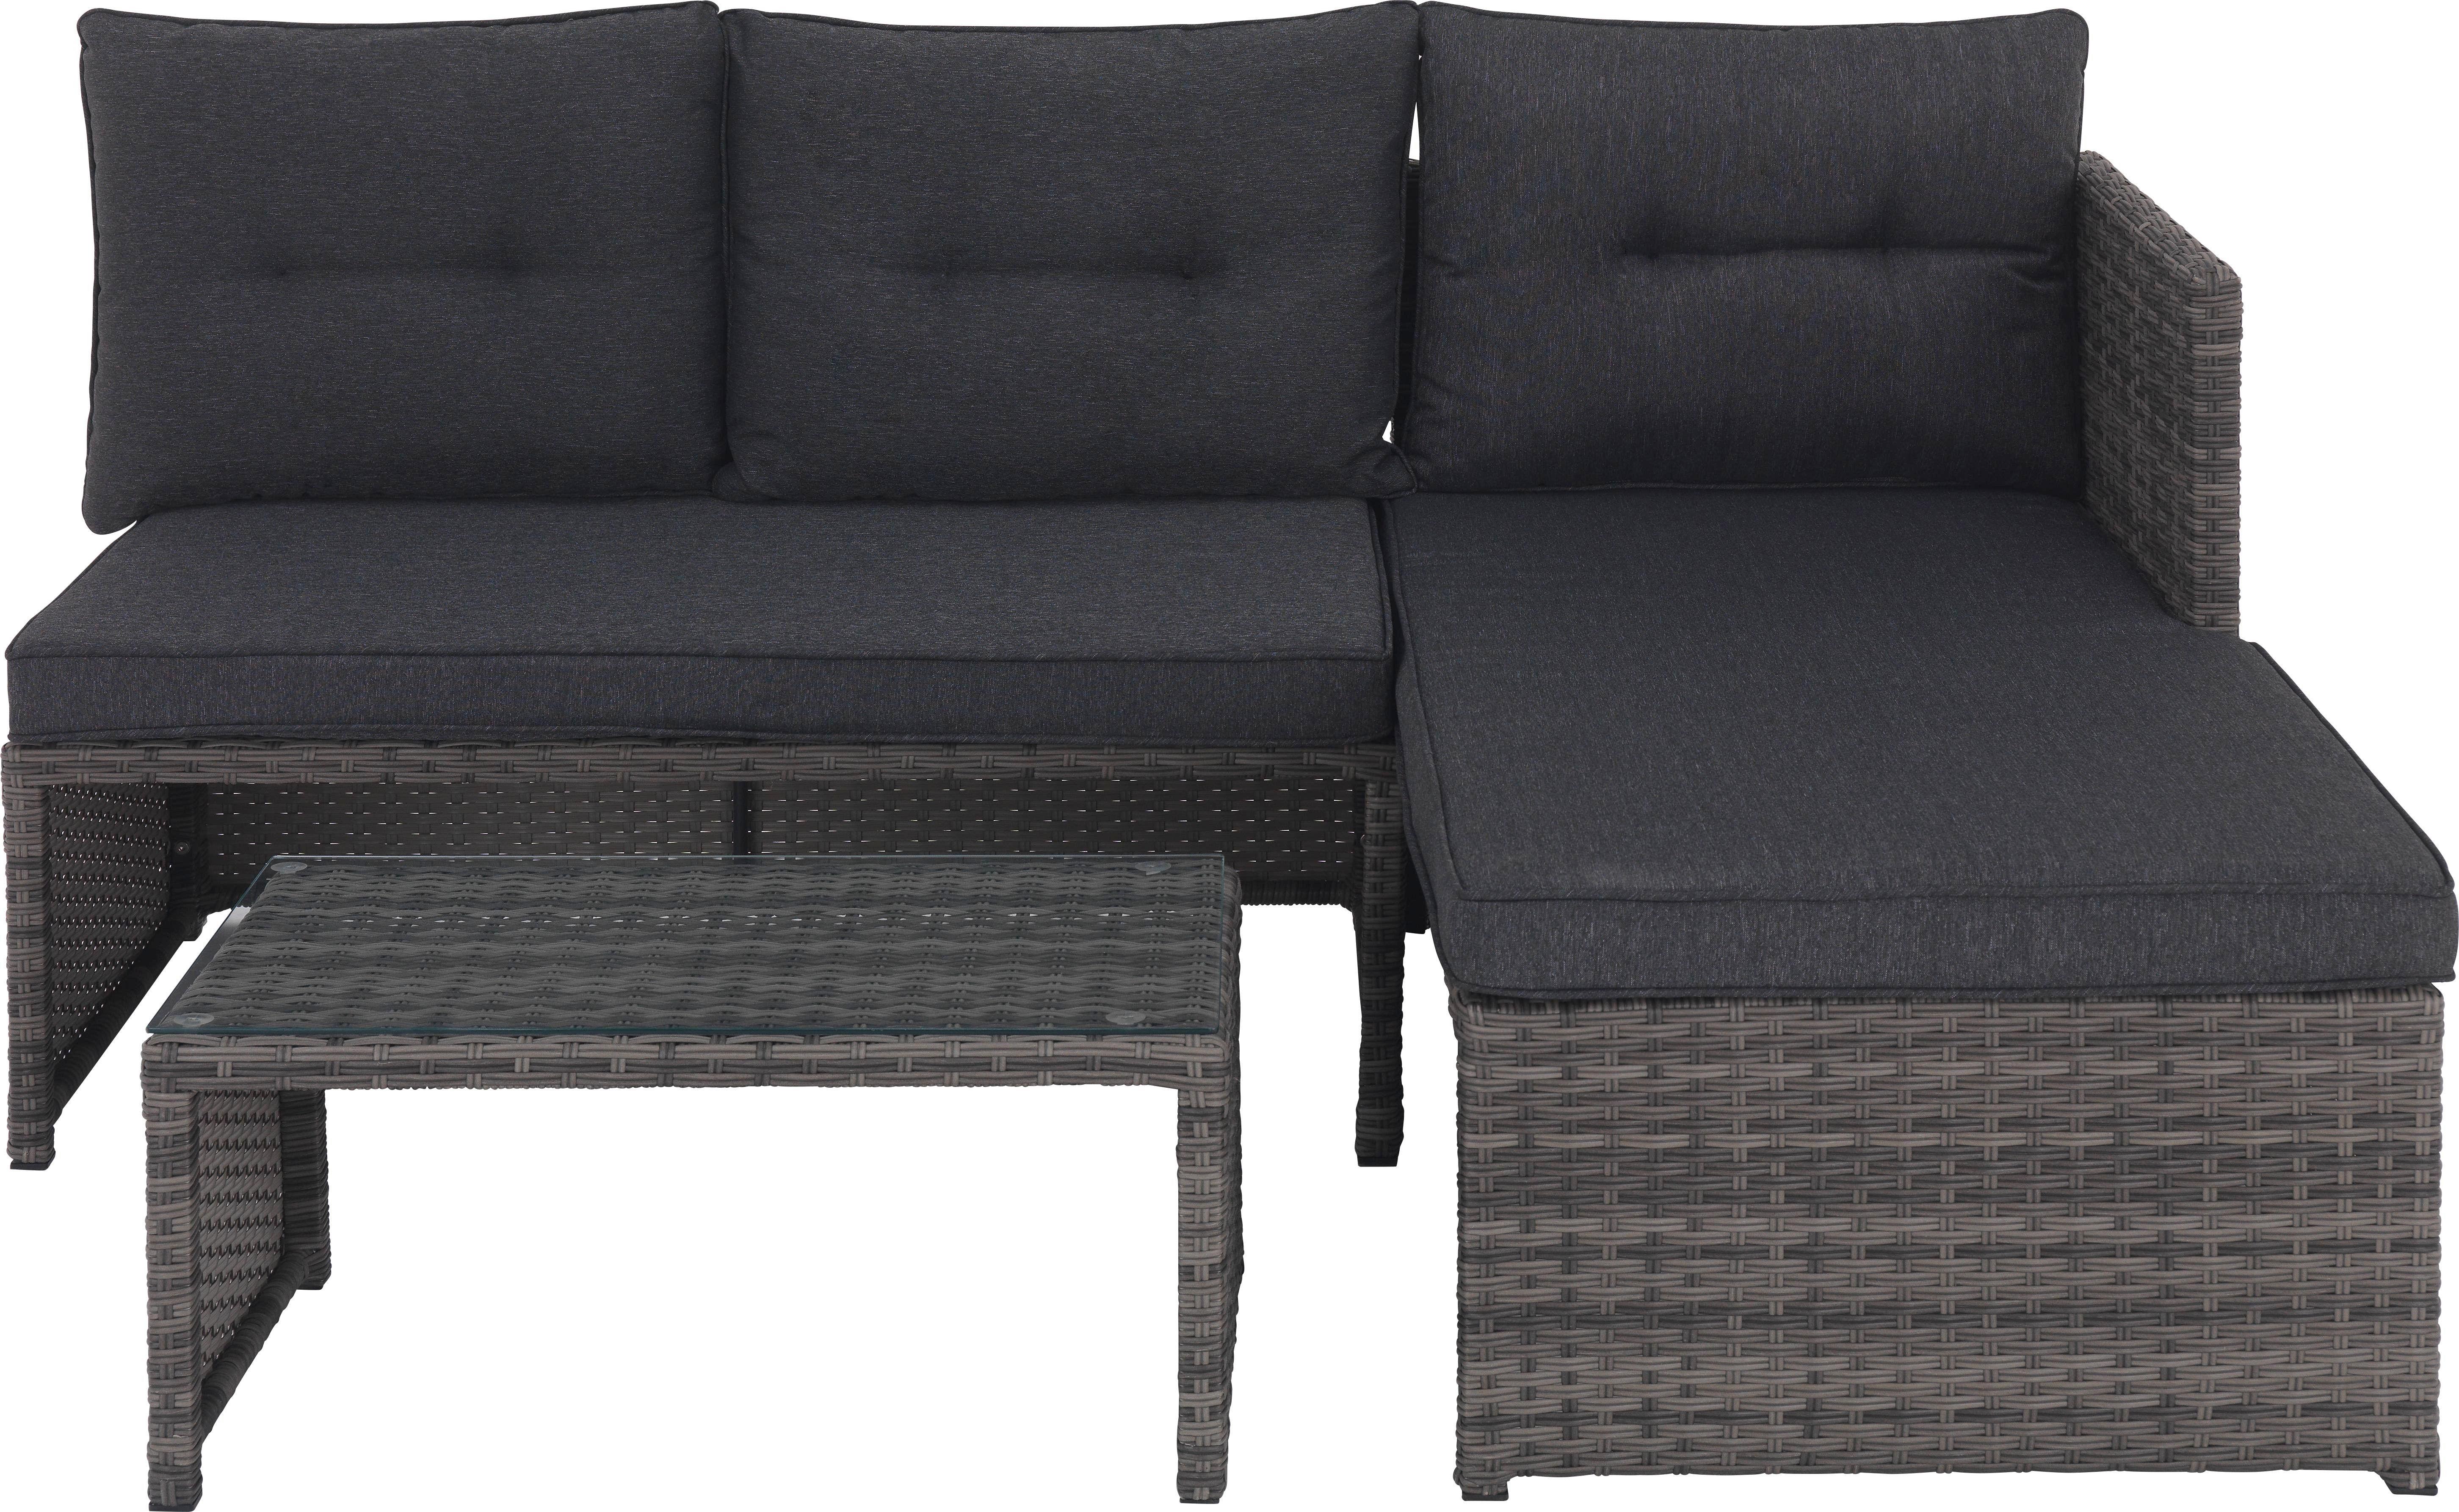 LOUNGEGARNITUR 7-teilig  173/120 cm - Grau, Design, Glas/Kunststoff (173/120cm) - Xora